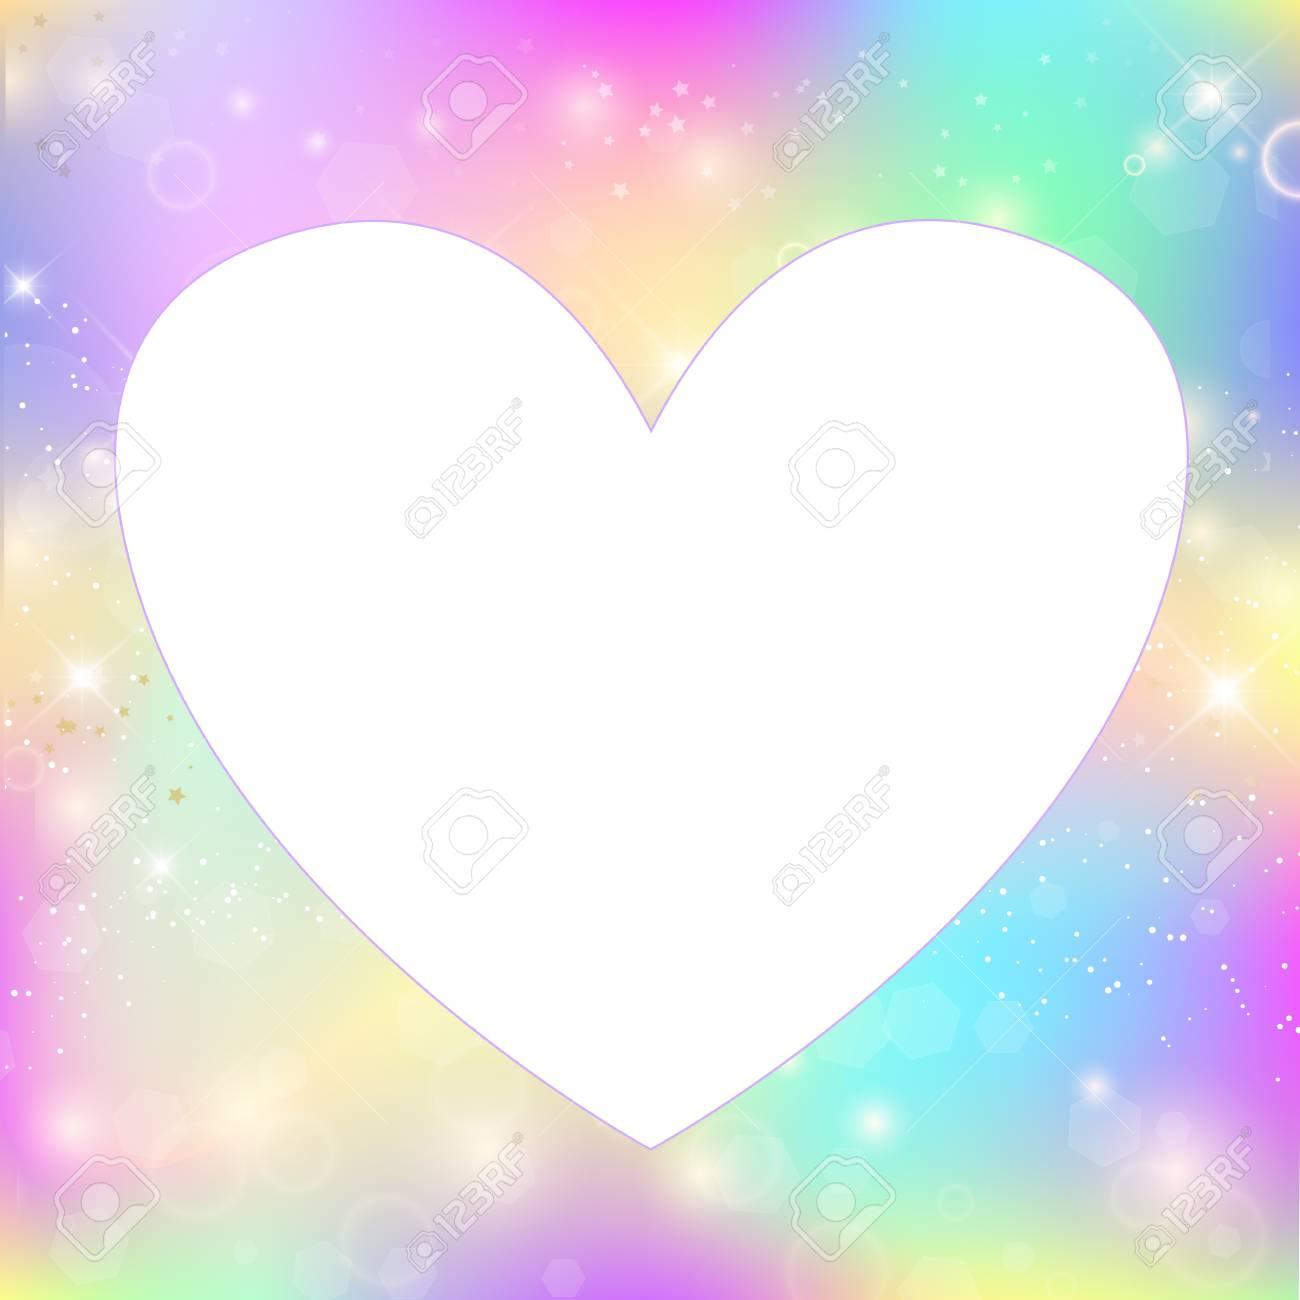 Heart Frame Magic Border With Rainbow Mesh, Girlish Universe ...